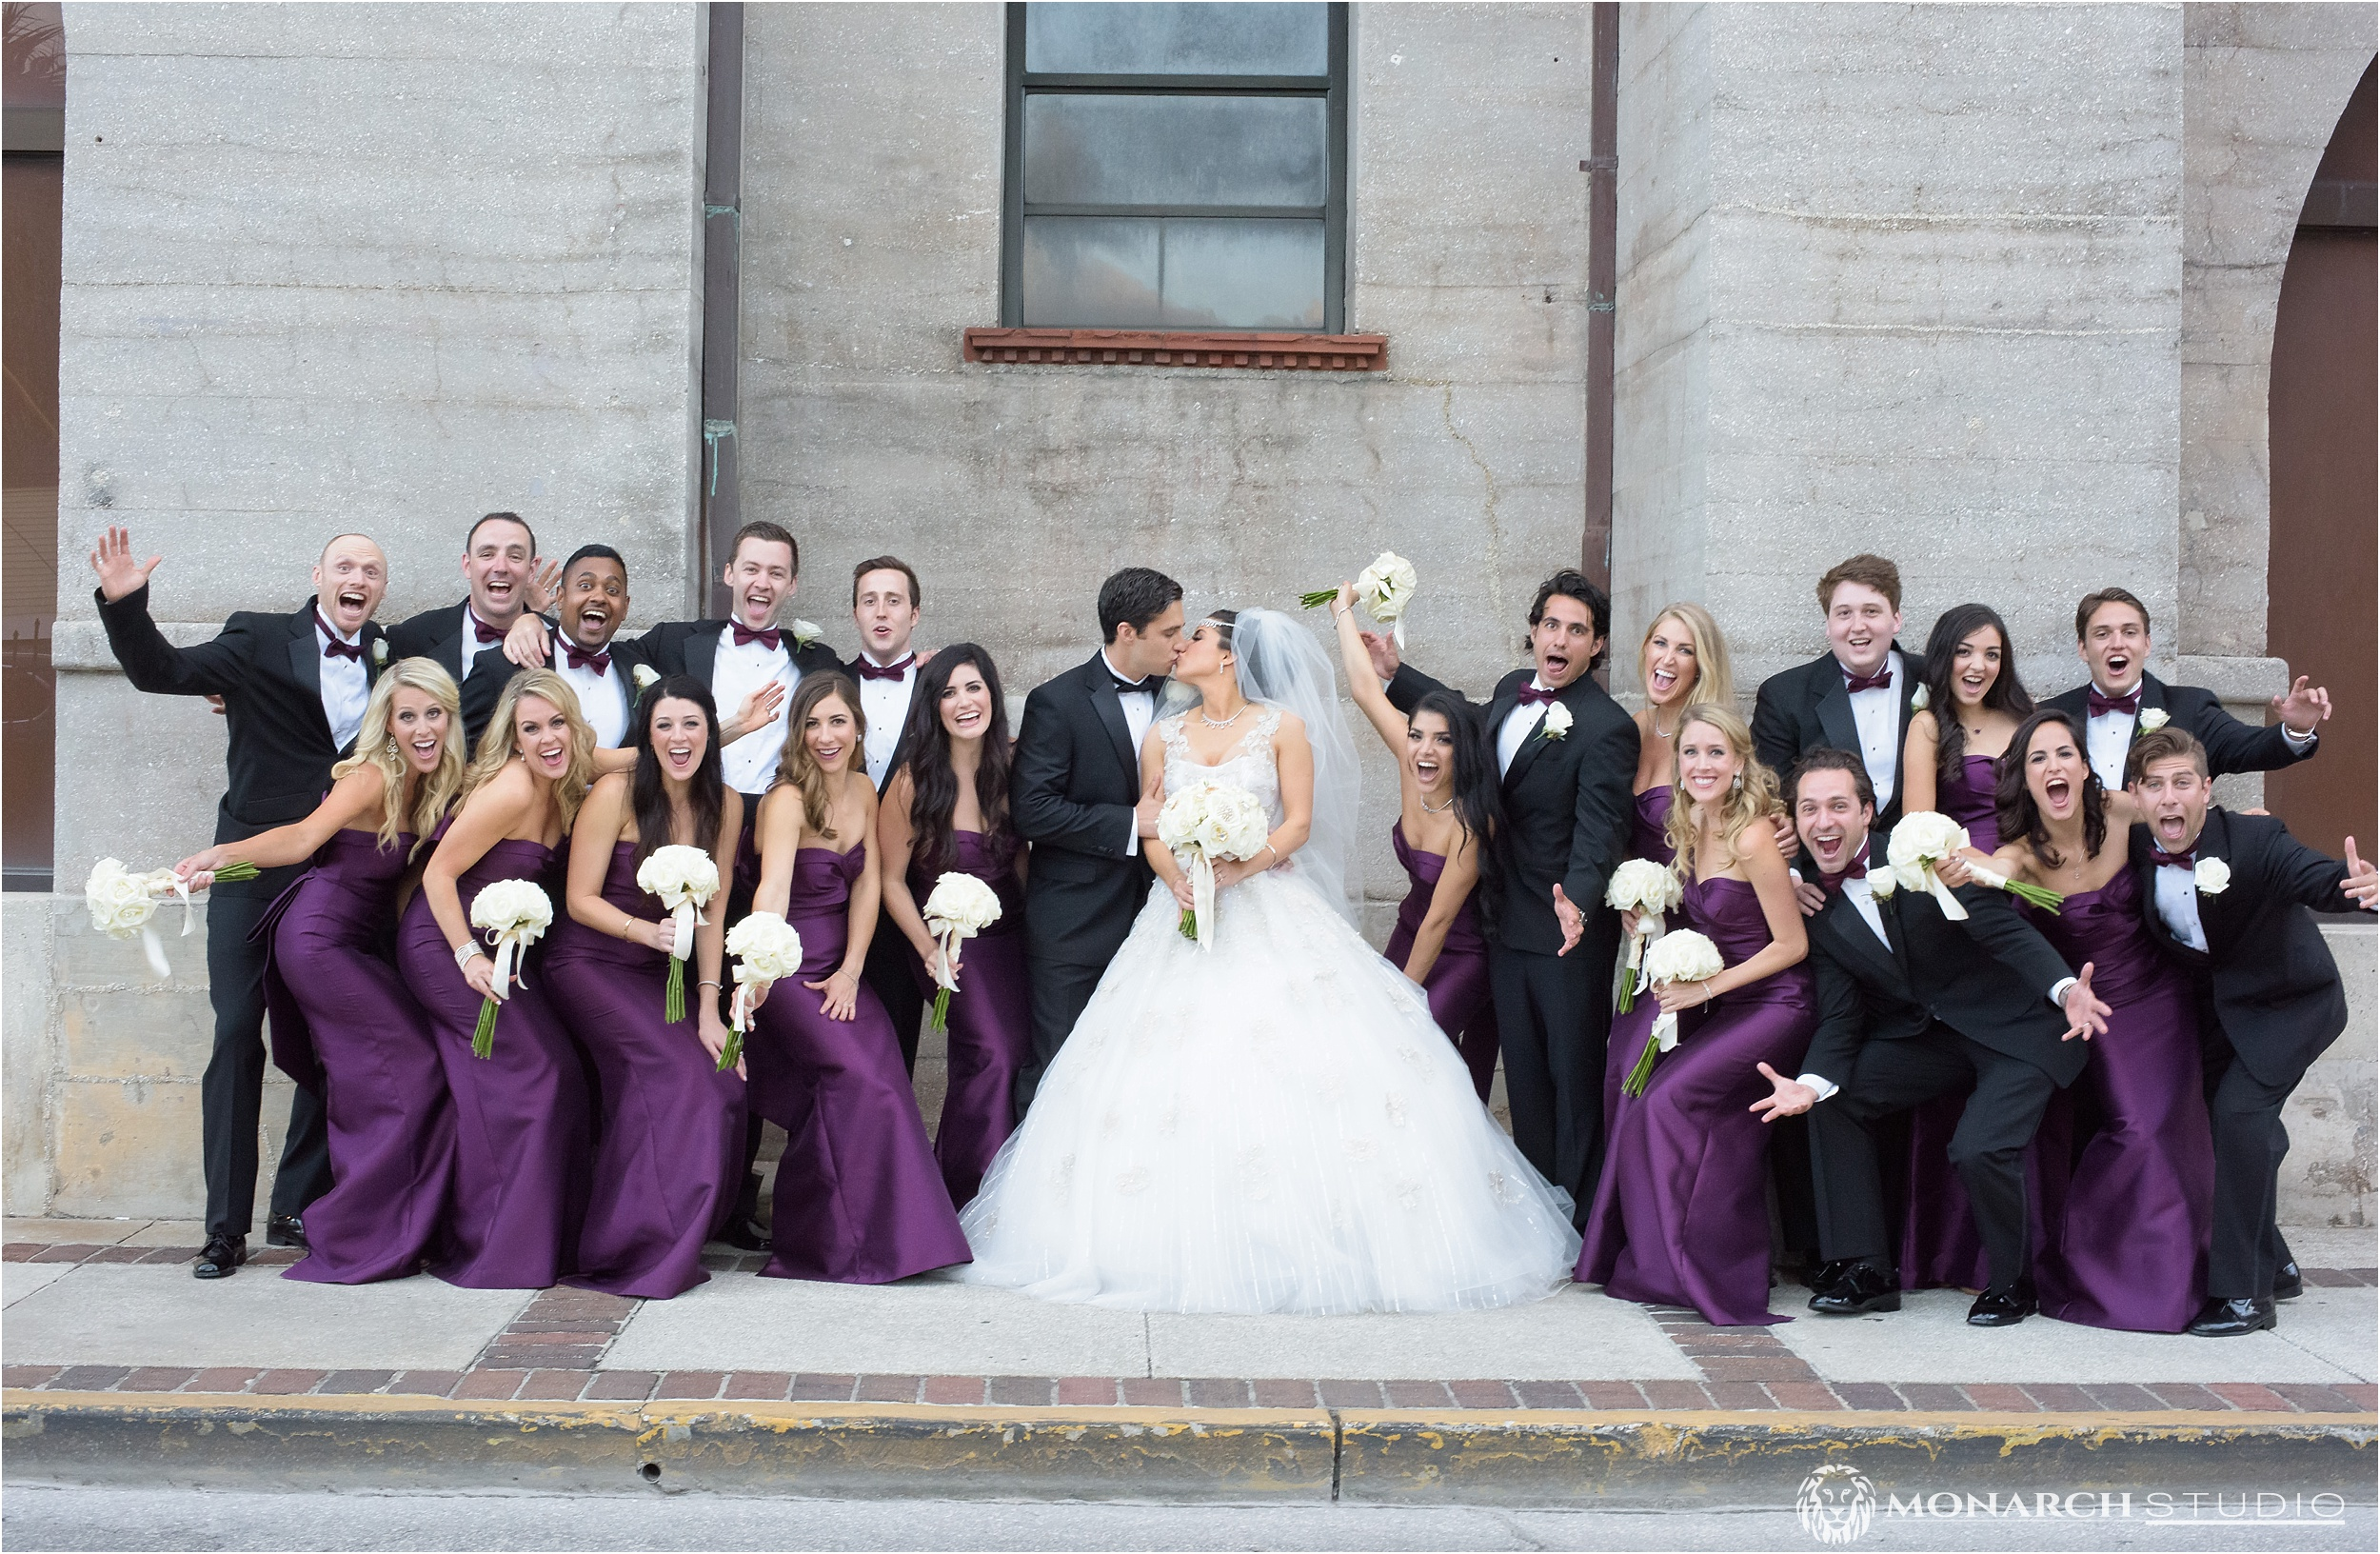 Persian-Aghd-Wedding-Photographer- سفره عقد-054.jpg